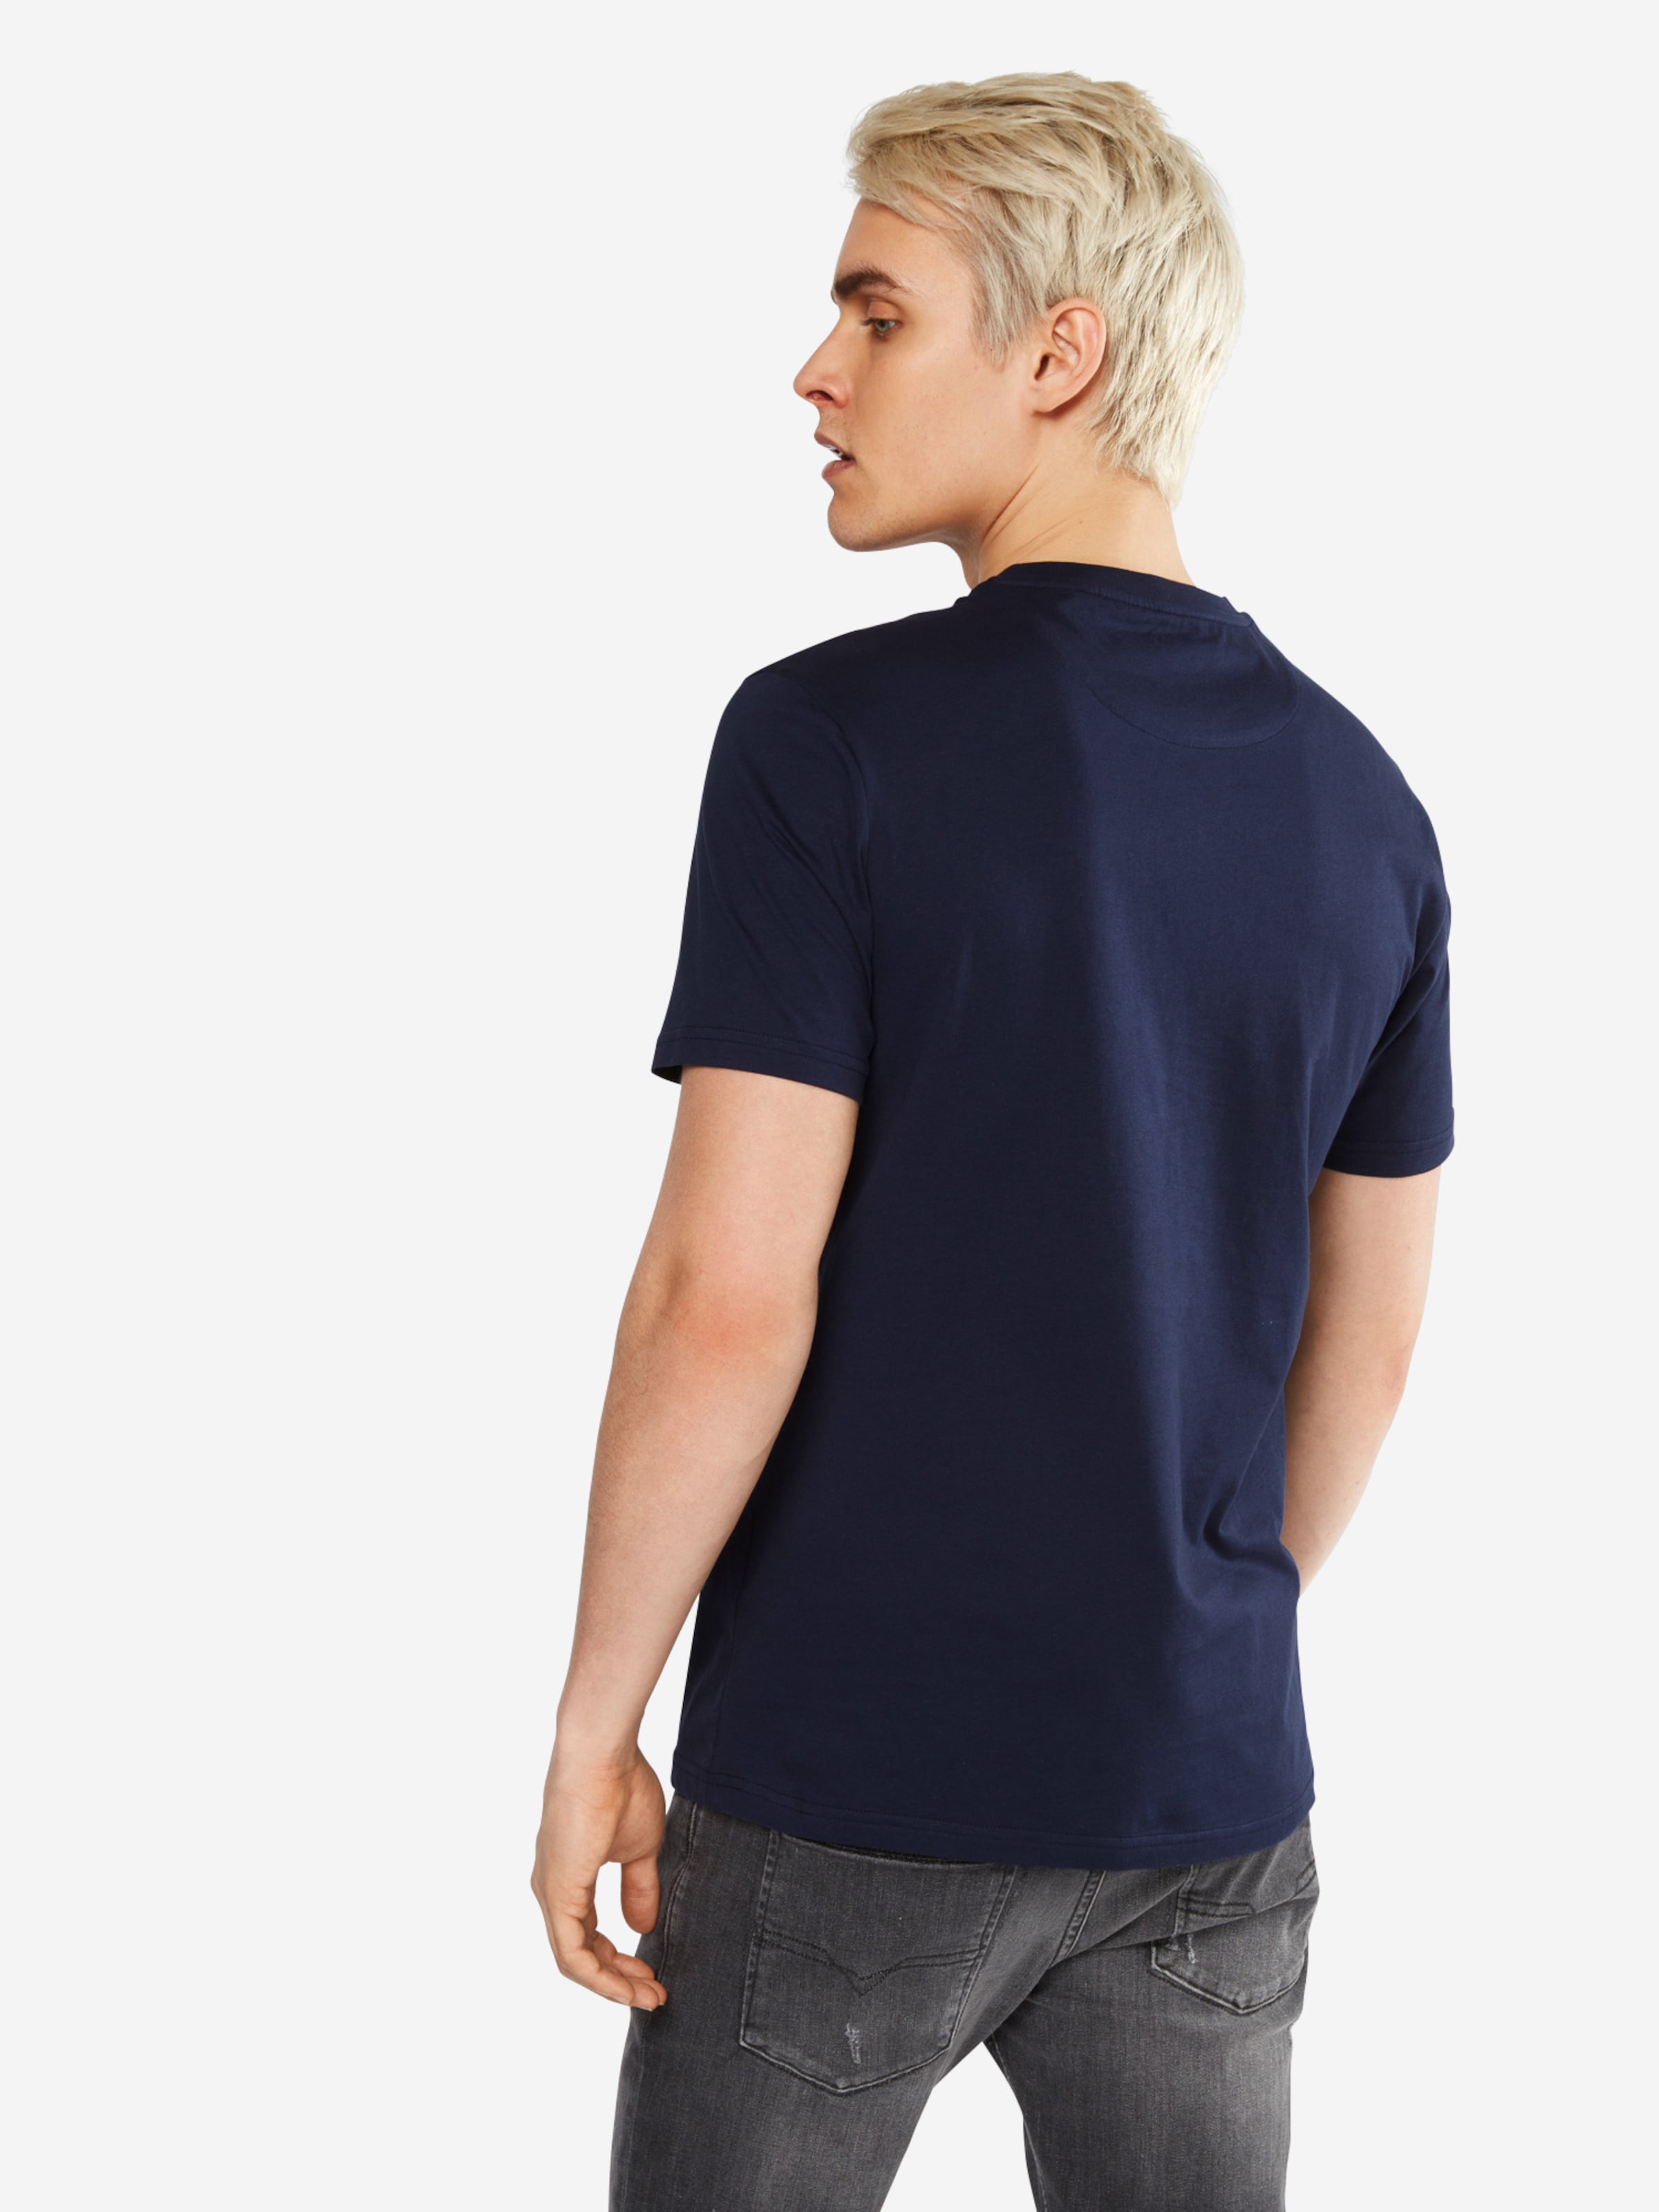 Lyle & Scott T-Shirt 'Stripe Pocket' Freiraum Suchen Rabatt Aaa Fälschung 2018 Neueste Online Spielraum Bestellen RM0e3